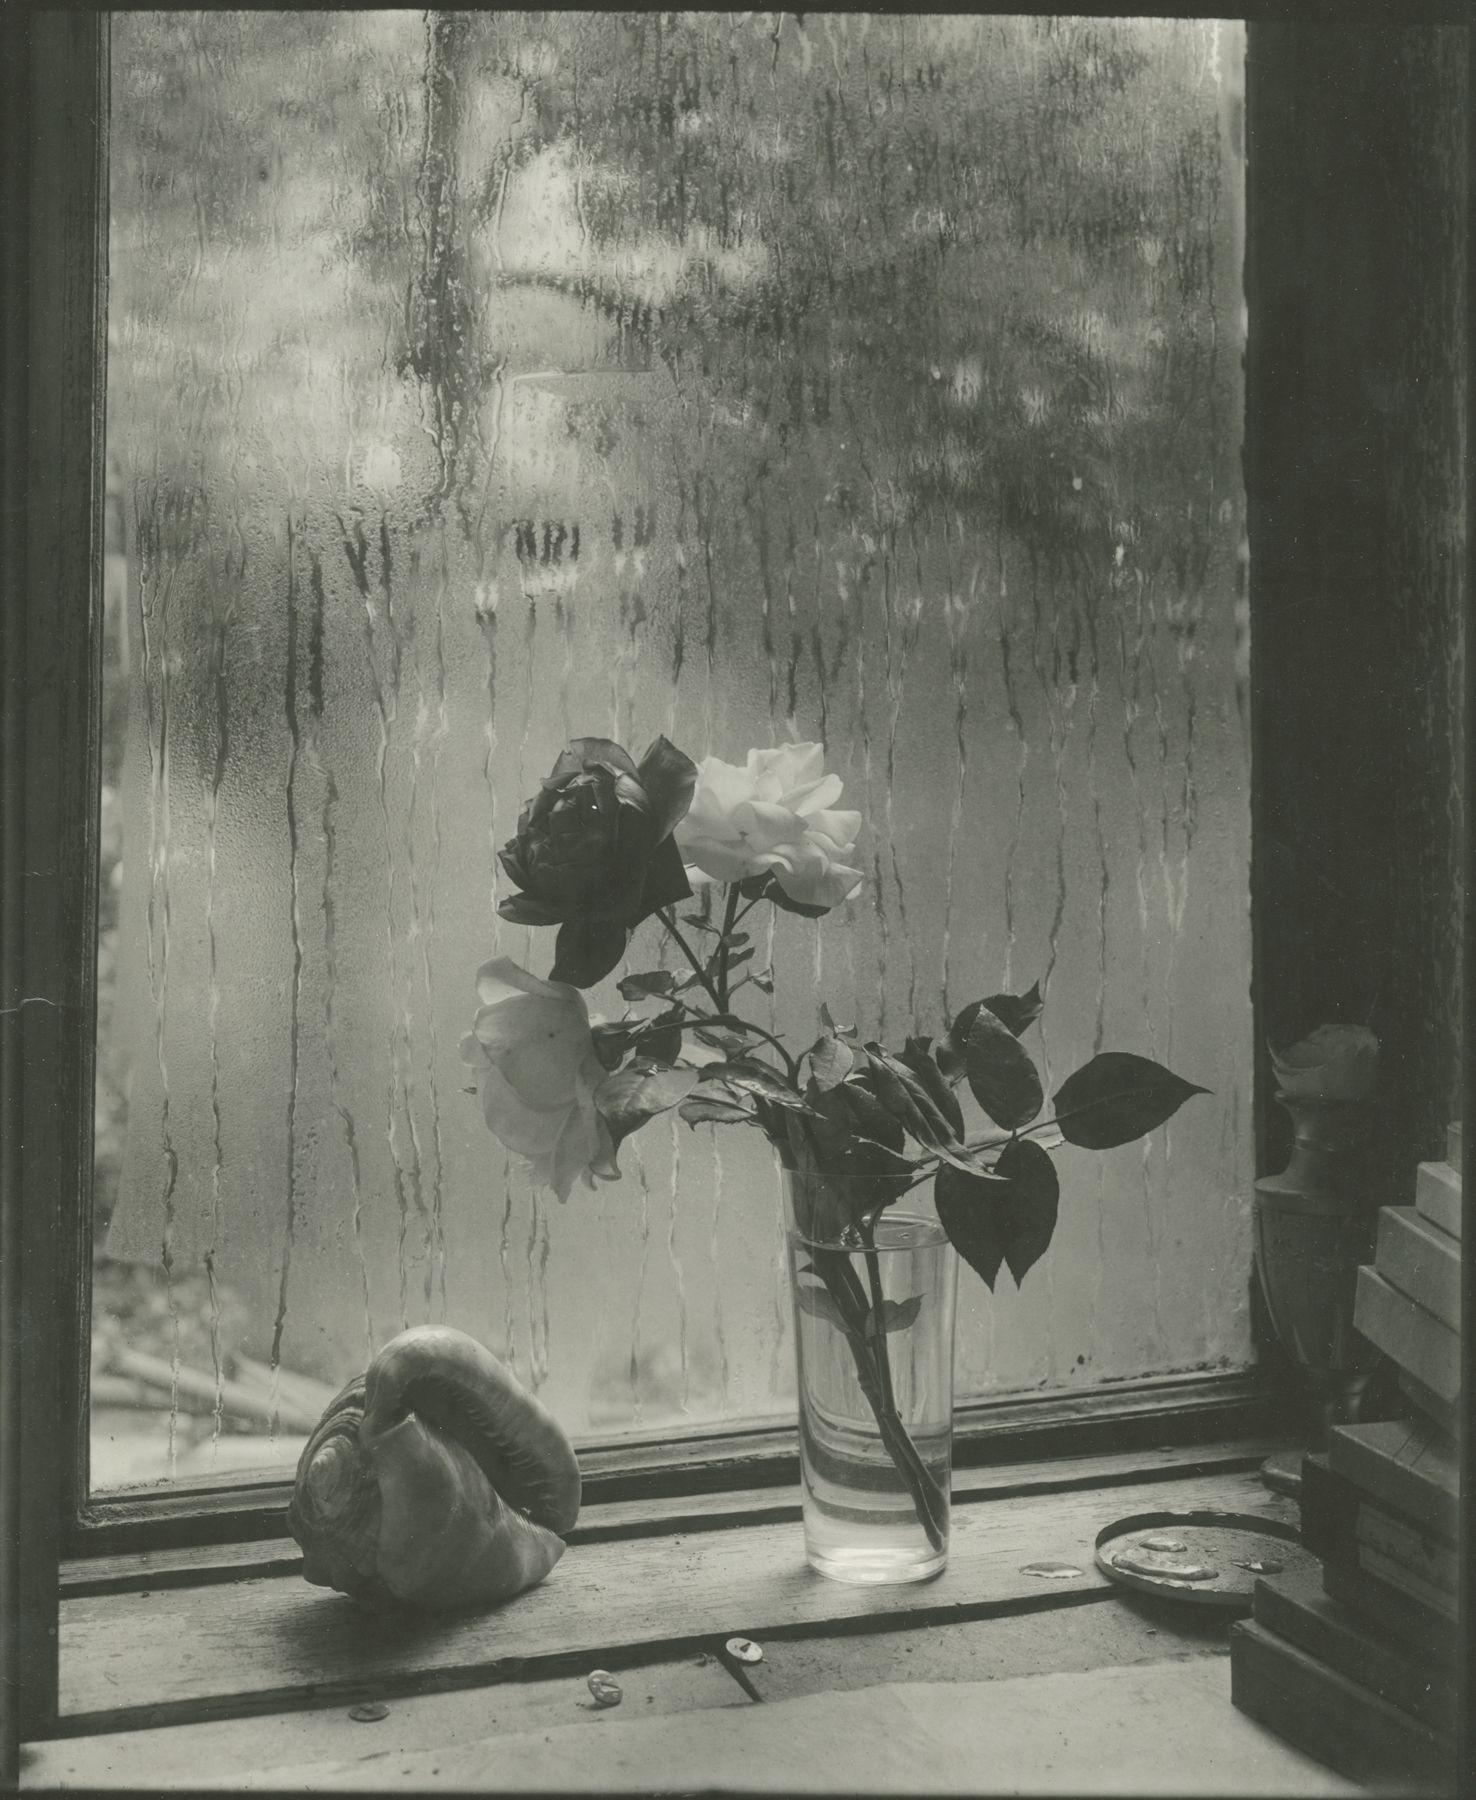 Josef Sudek, Last Rose, 1956, Bard x HGG, Howard Greenberg Gallery, 2019